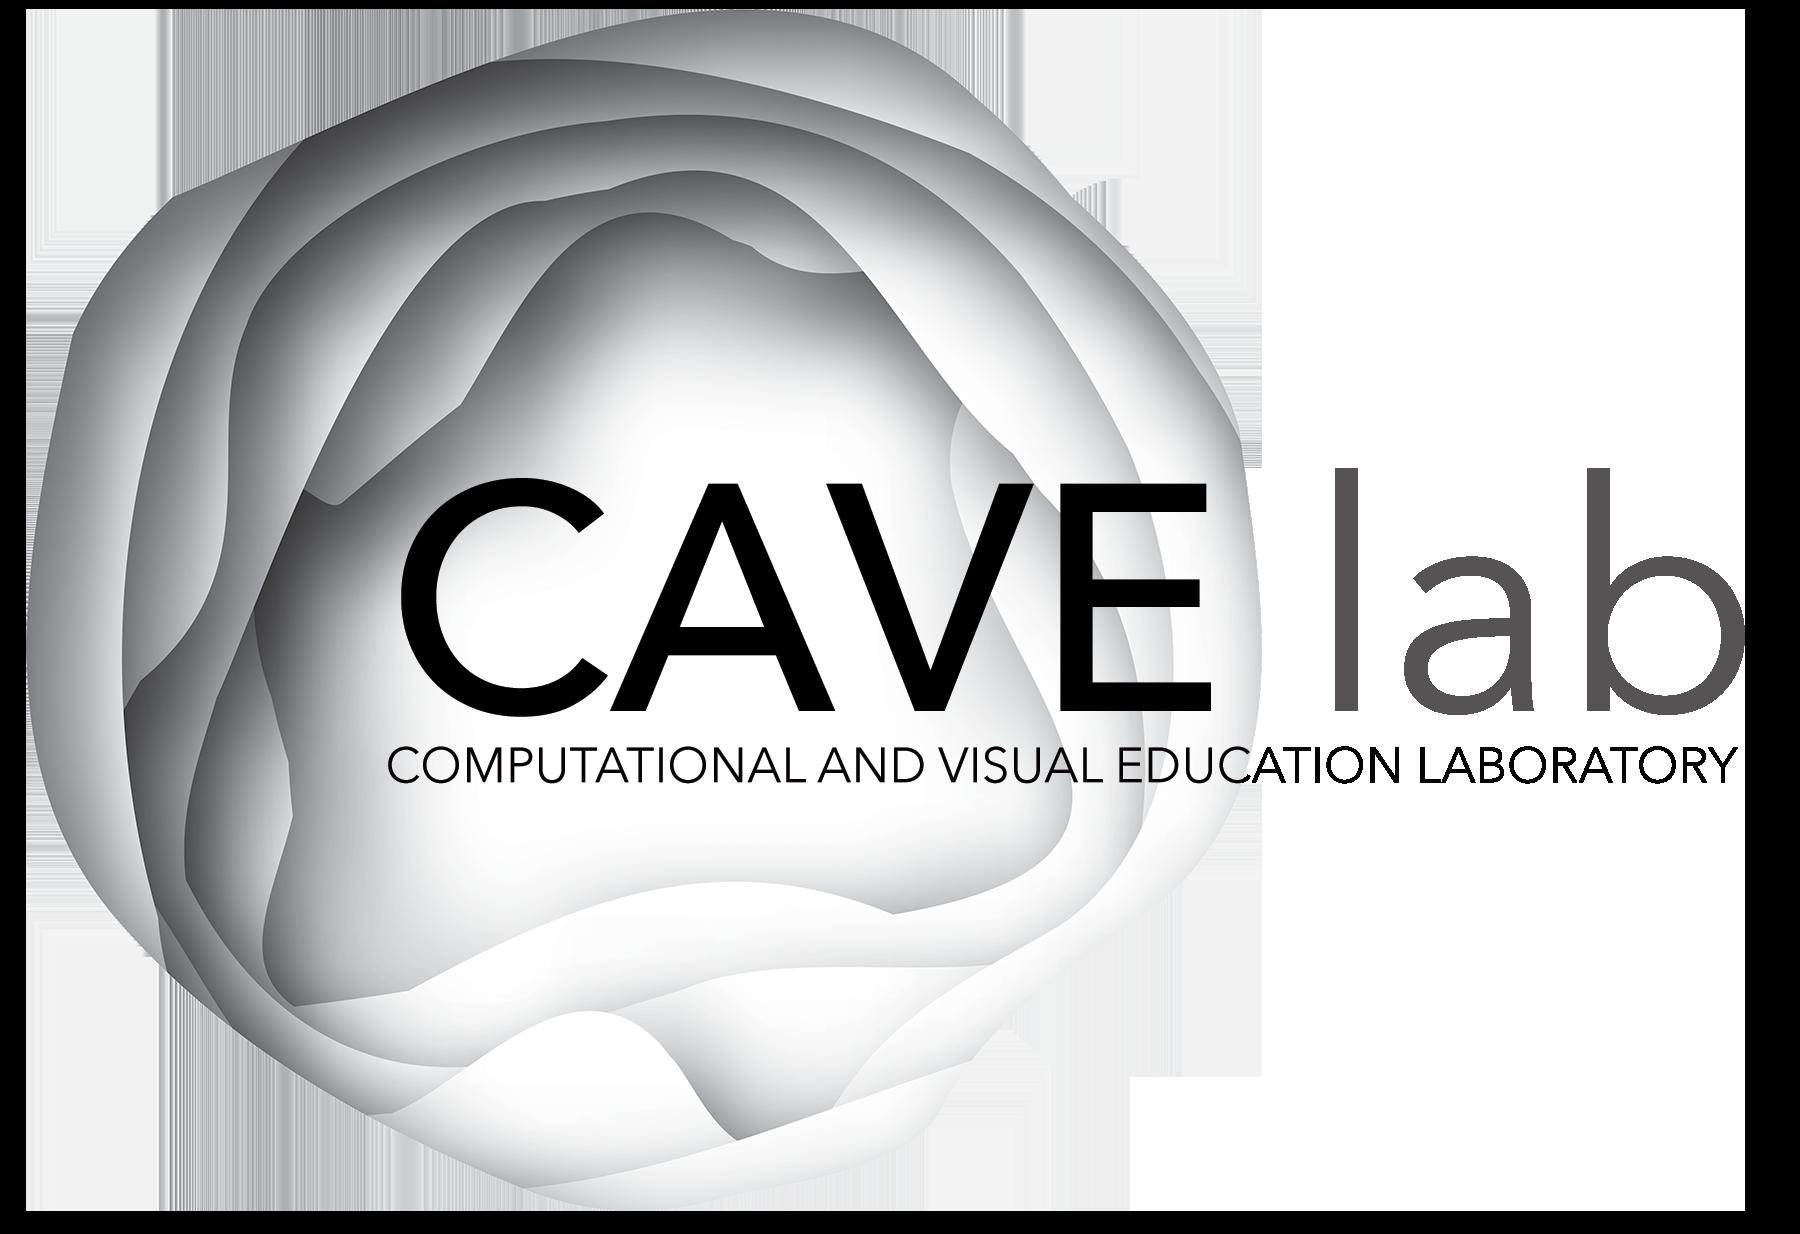 MIT CAVE Lab